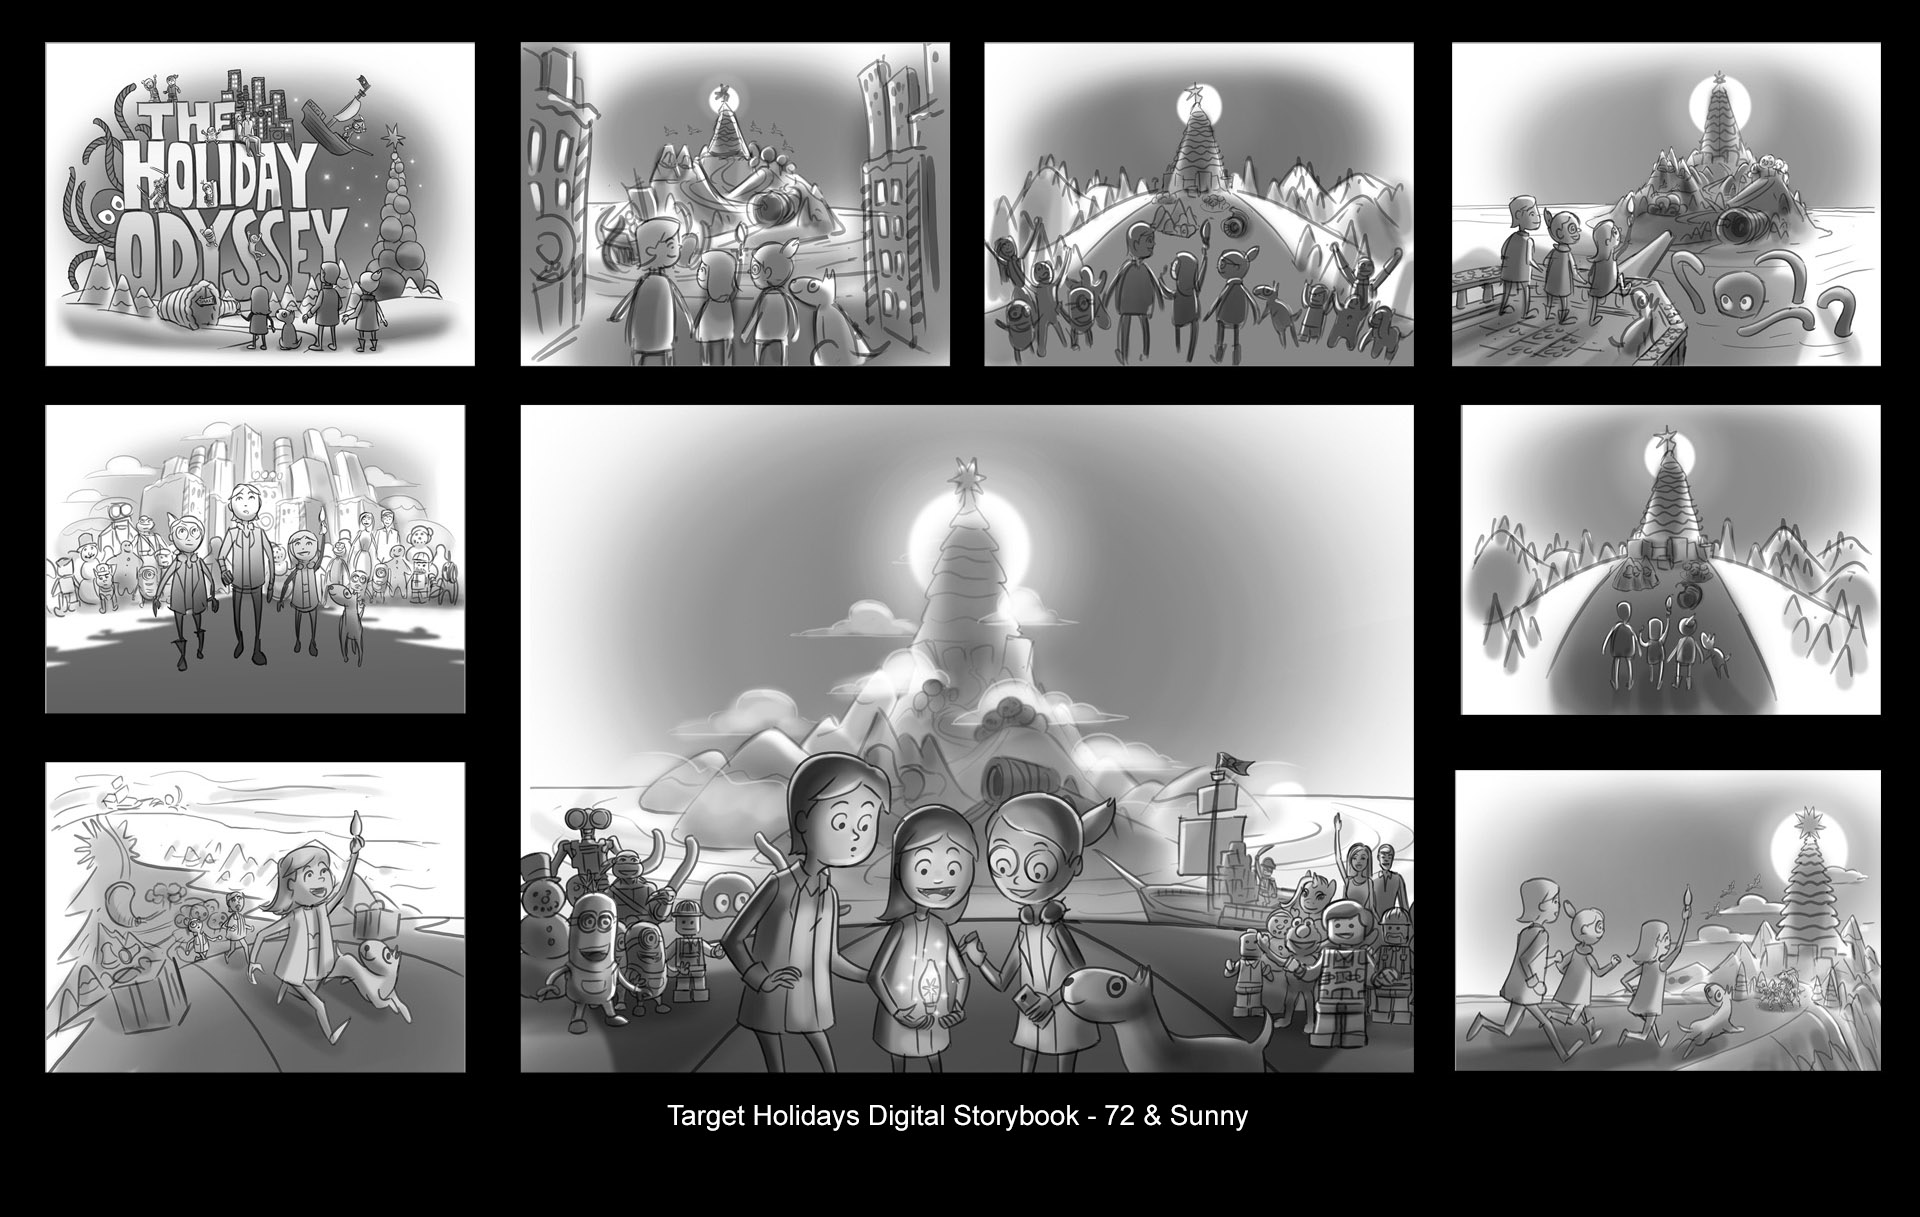 Target Holiday Storybook Cover.jpg